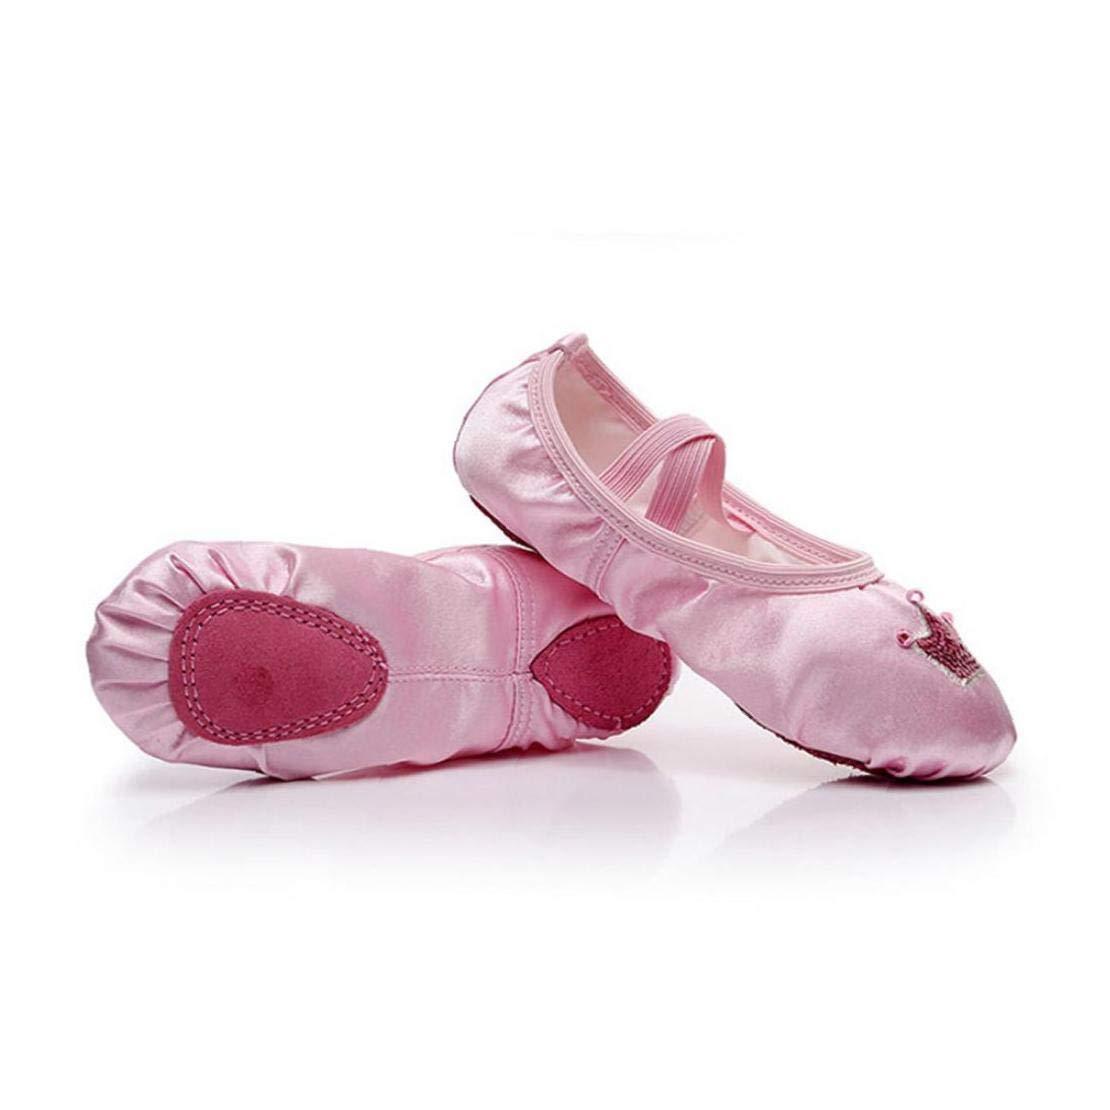 size 25 1 pair pink satin ballet shoes Yoga Wear resistant canvas split belly dancing shoes Gymnastics Sole Flat Shoes for little girls